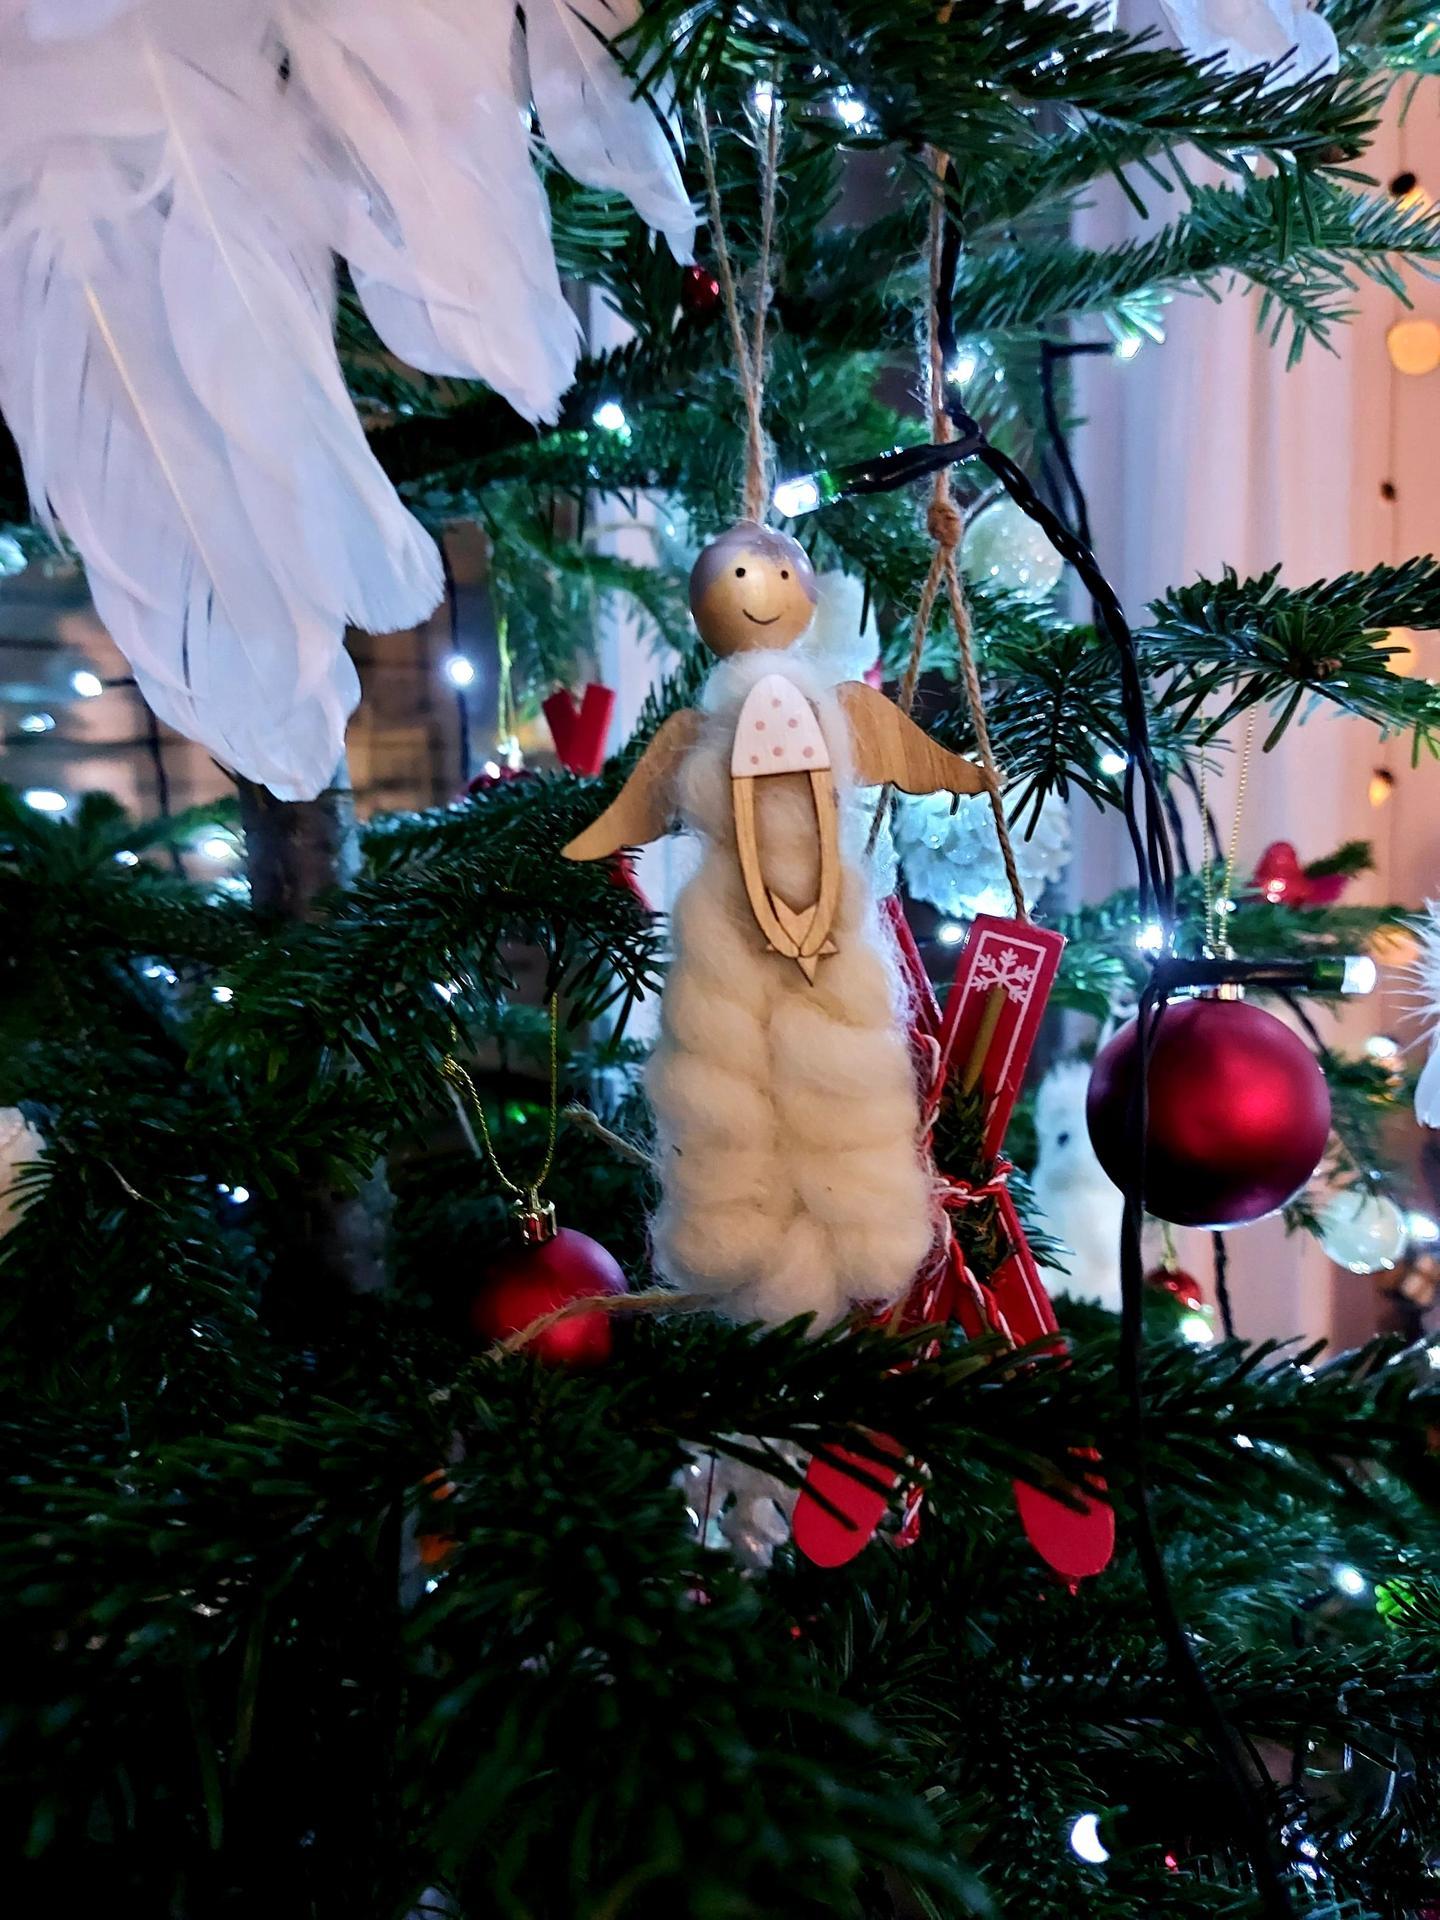 *čriepky od Nás* - Christmas is comming .....